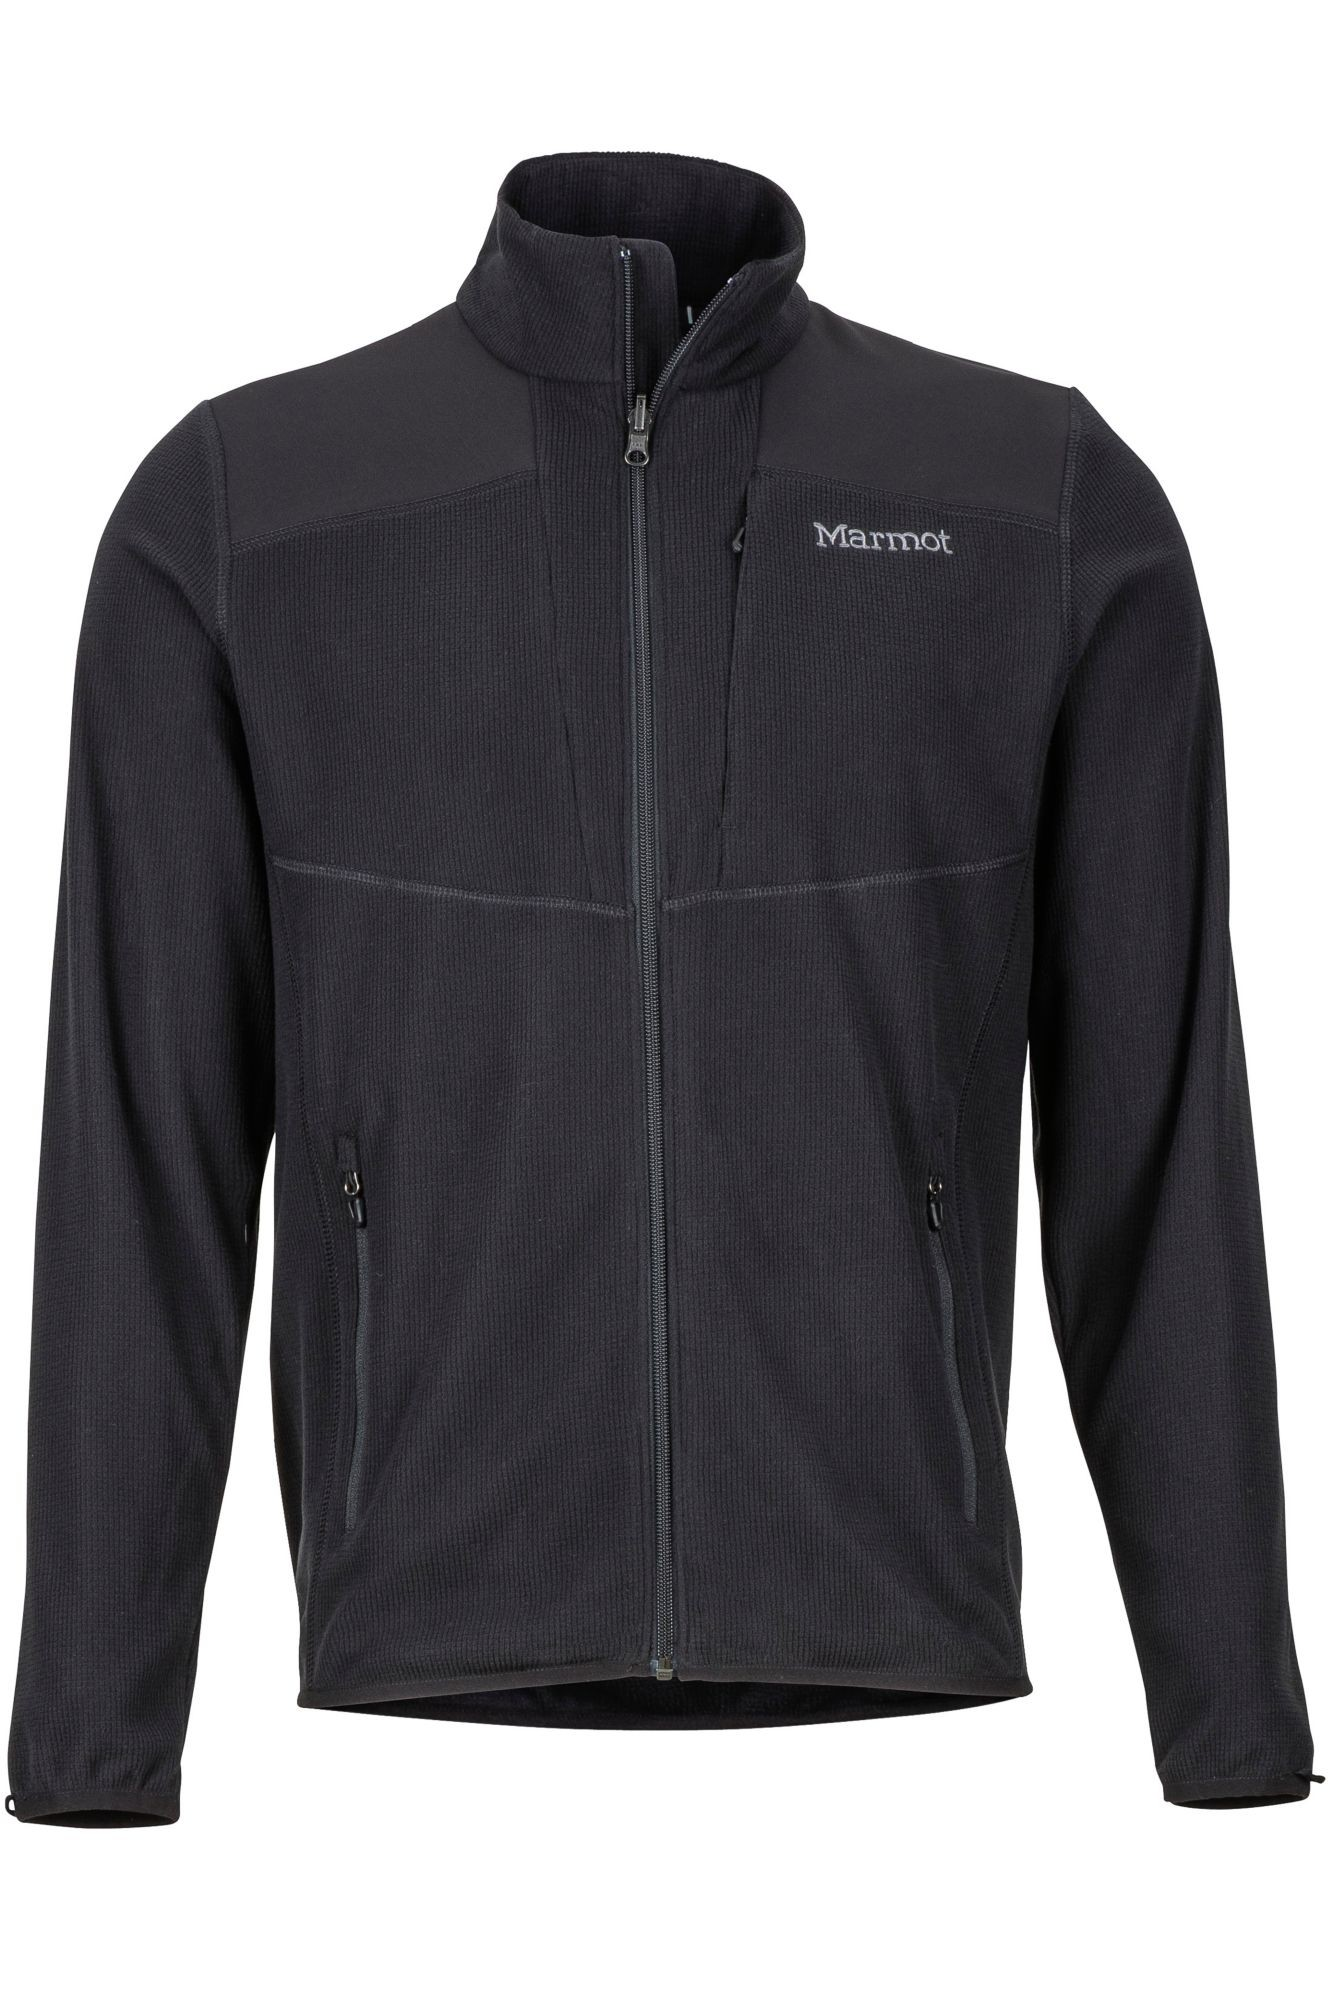 Marmot Reactor Jacket - Polaire homme